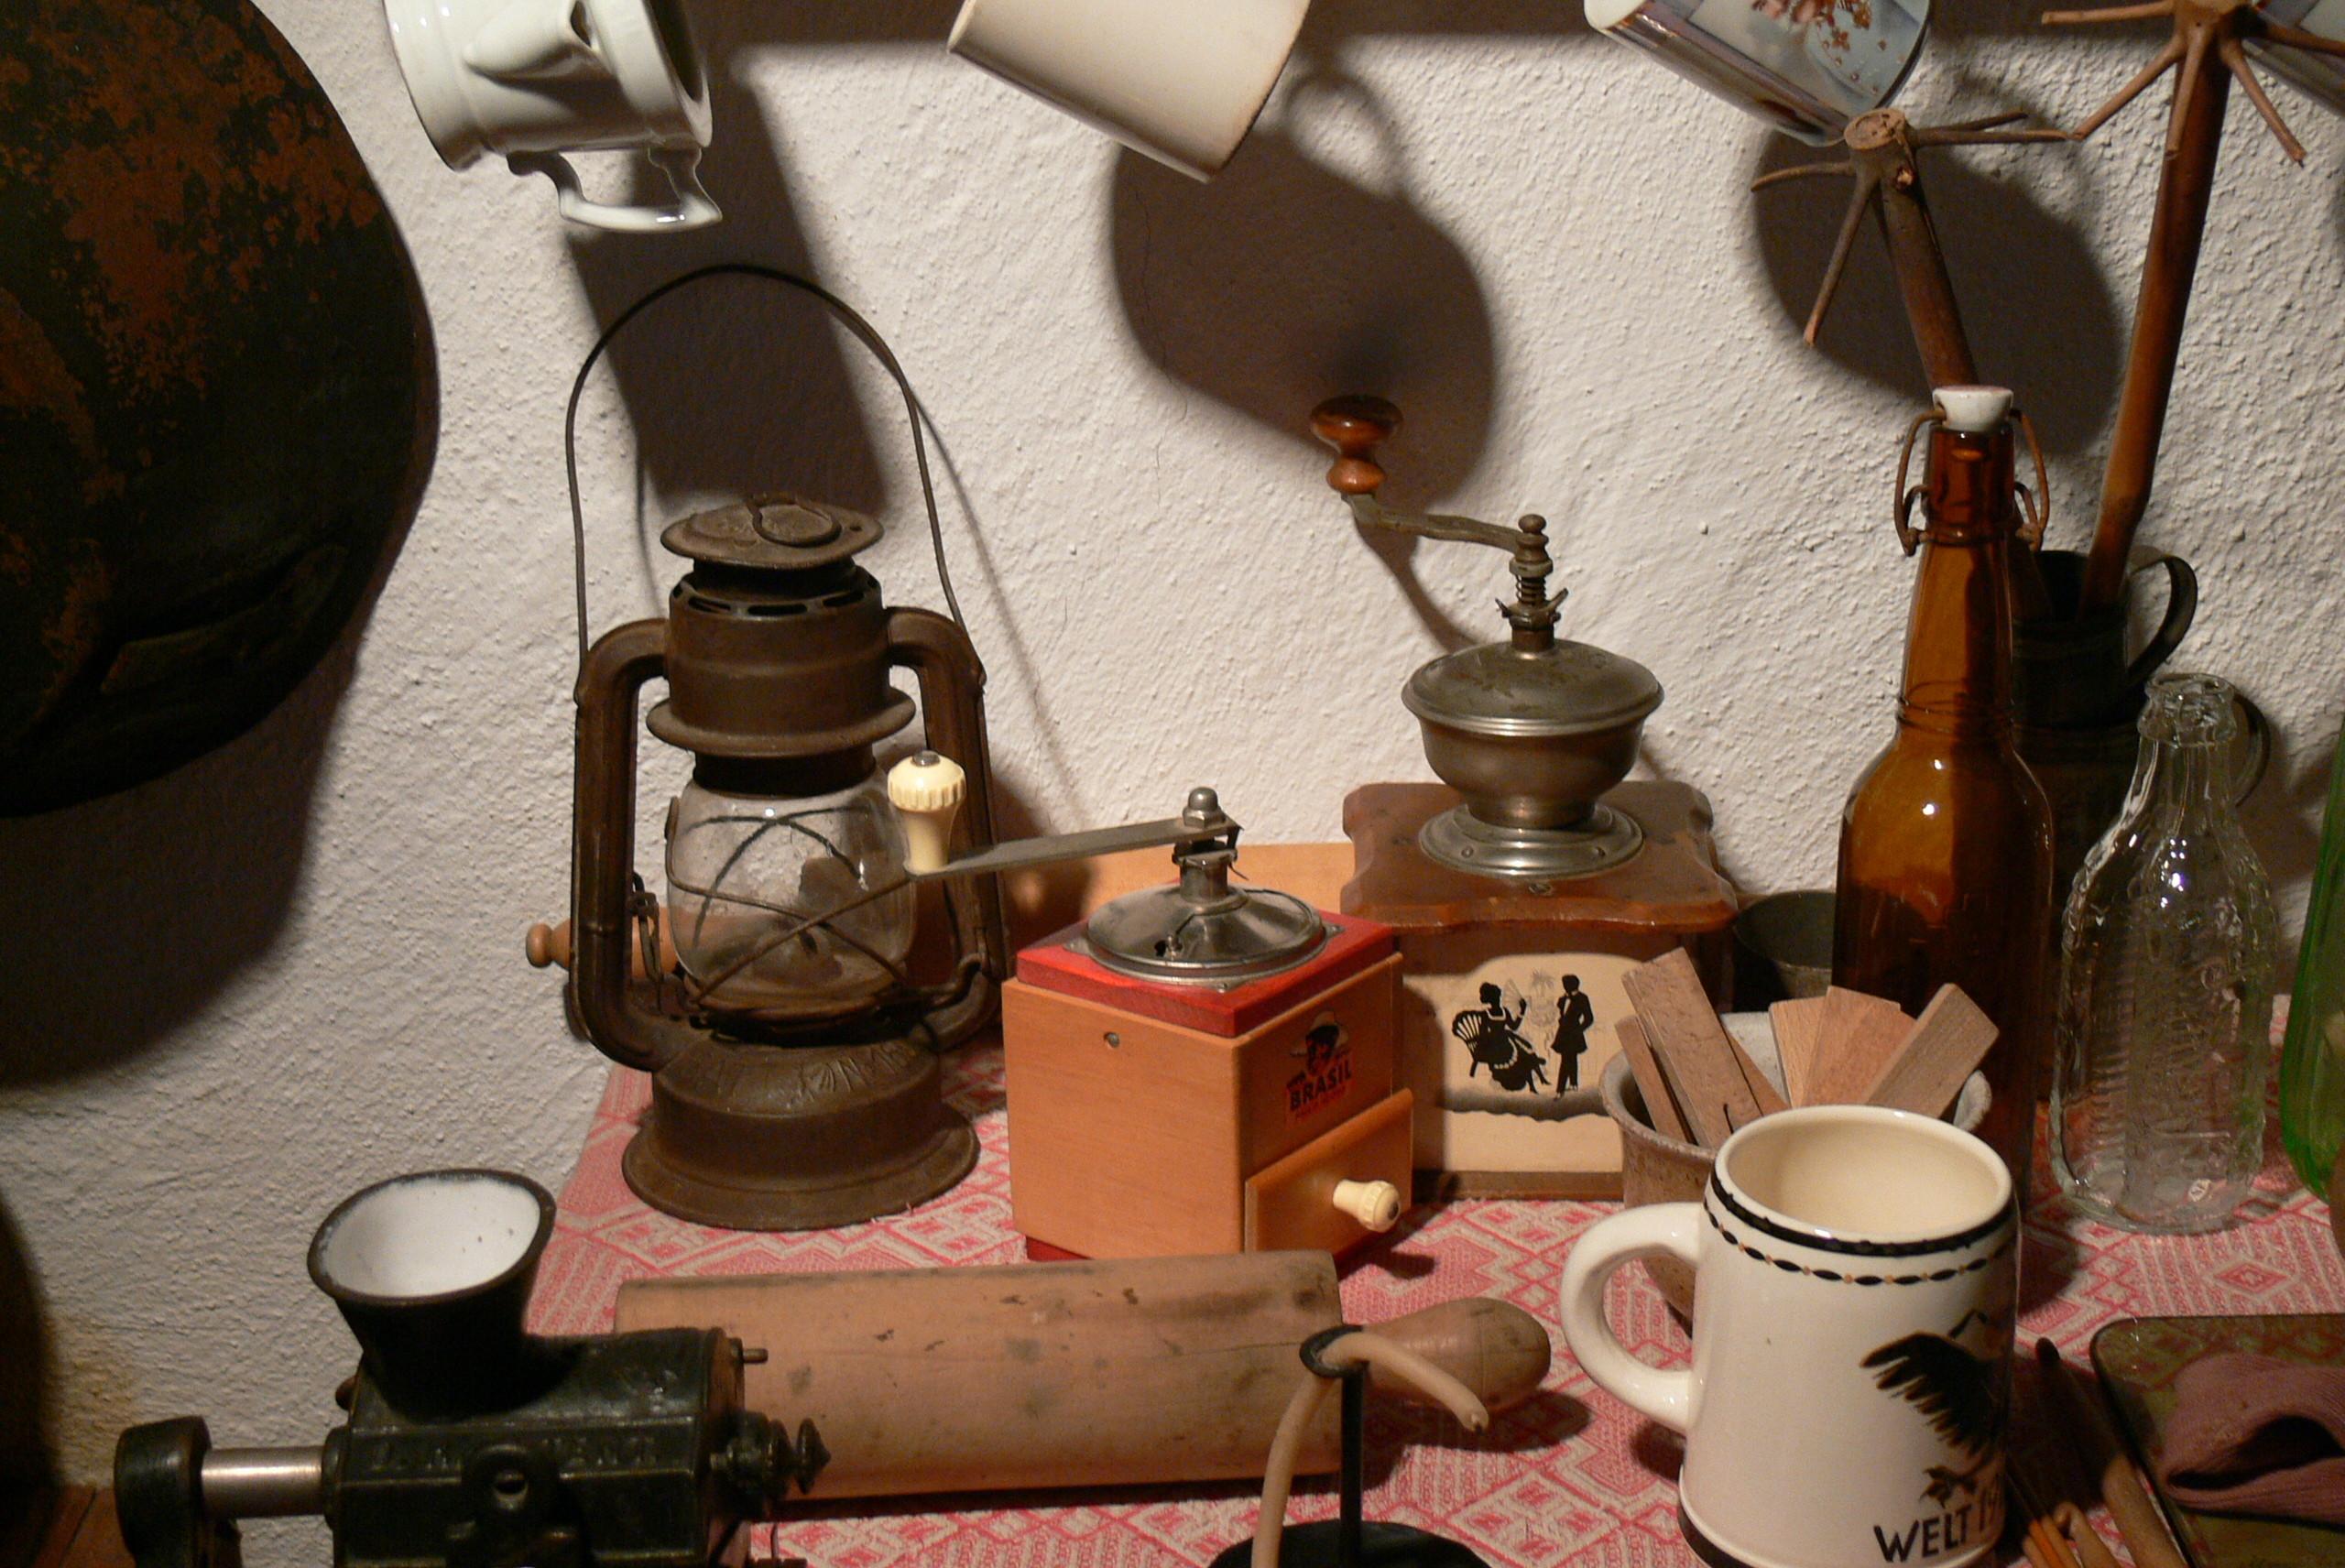 File:LMK - Küche 3 Kaffeemühlen.jpg - Wikimedia Commons | {Kaffeemühlen 18}